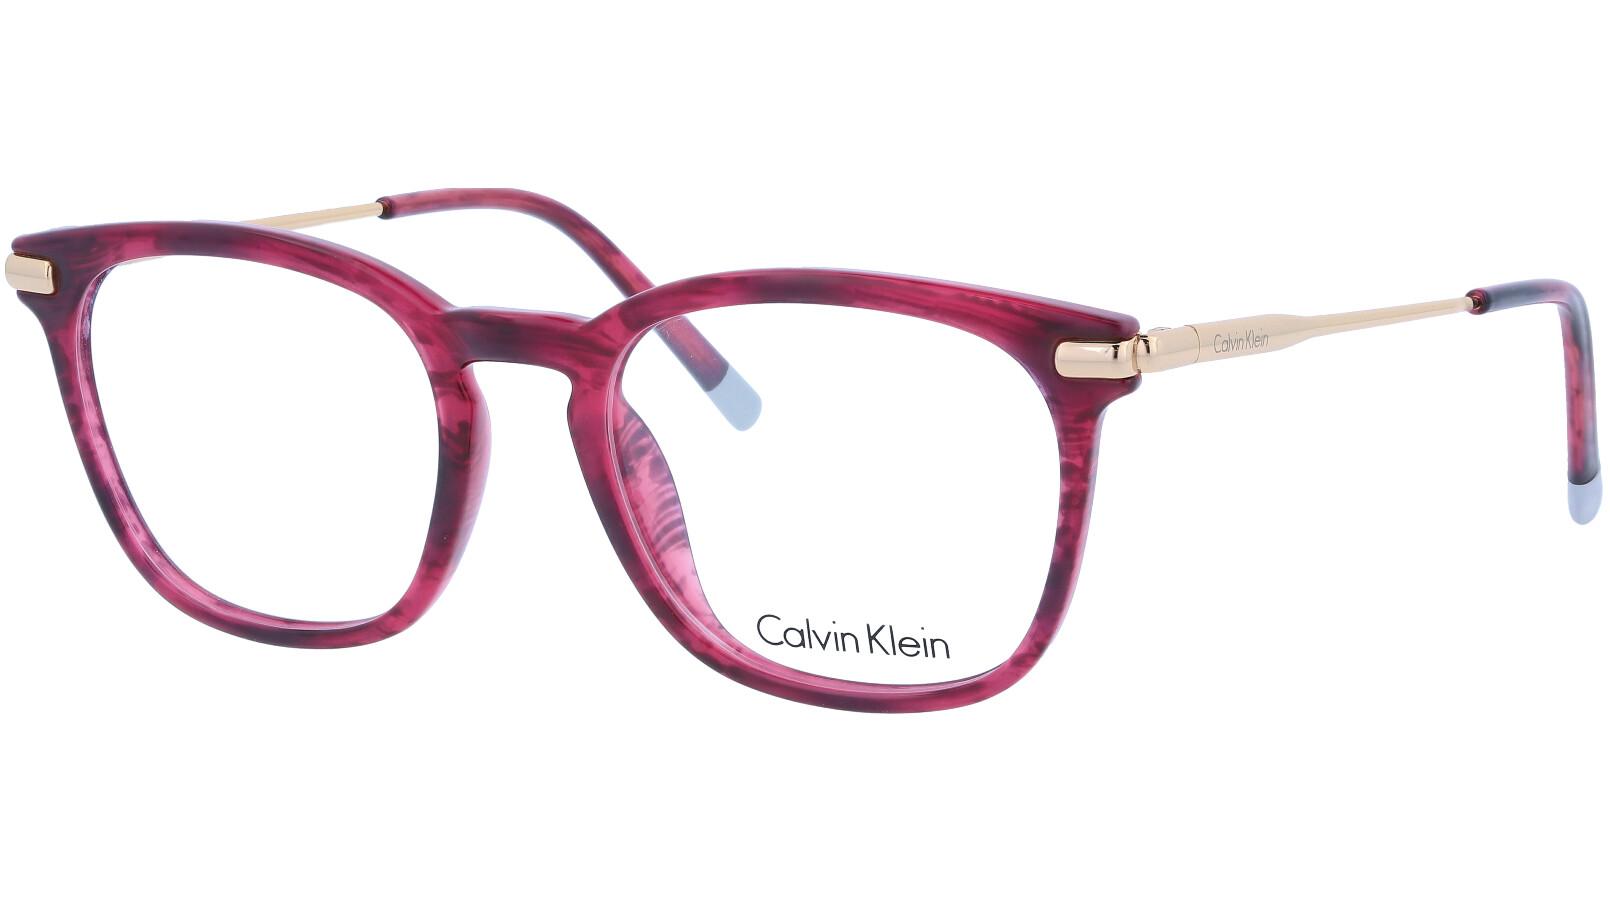 CALVIN KLEIN CK5965 609 52 STRIPED Glasses